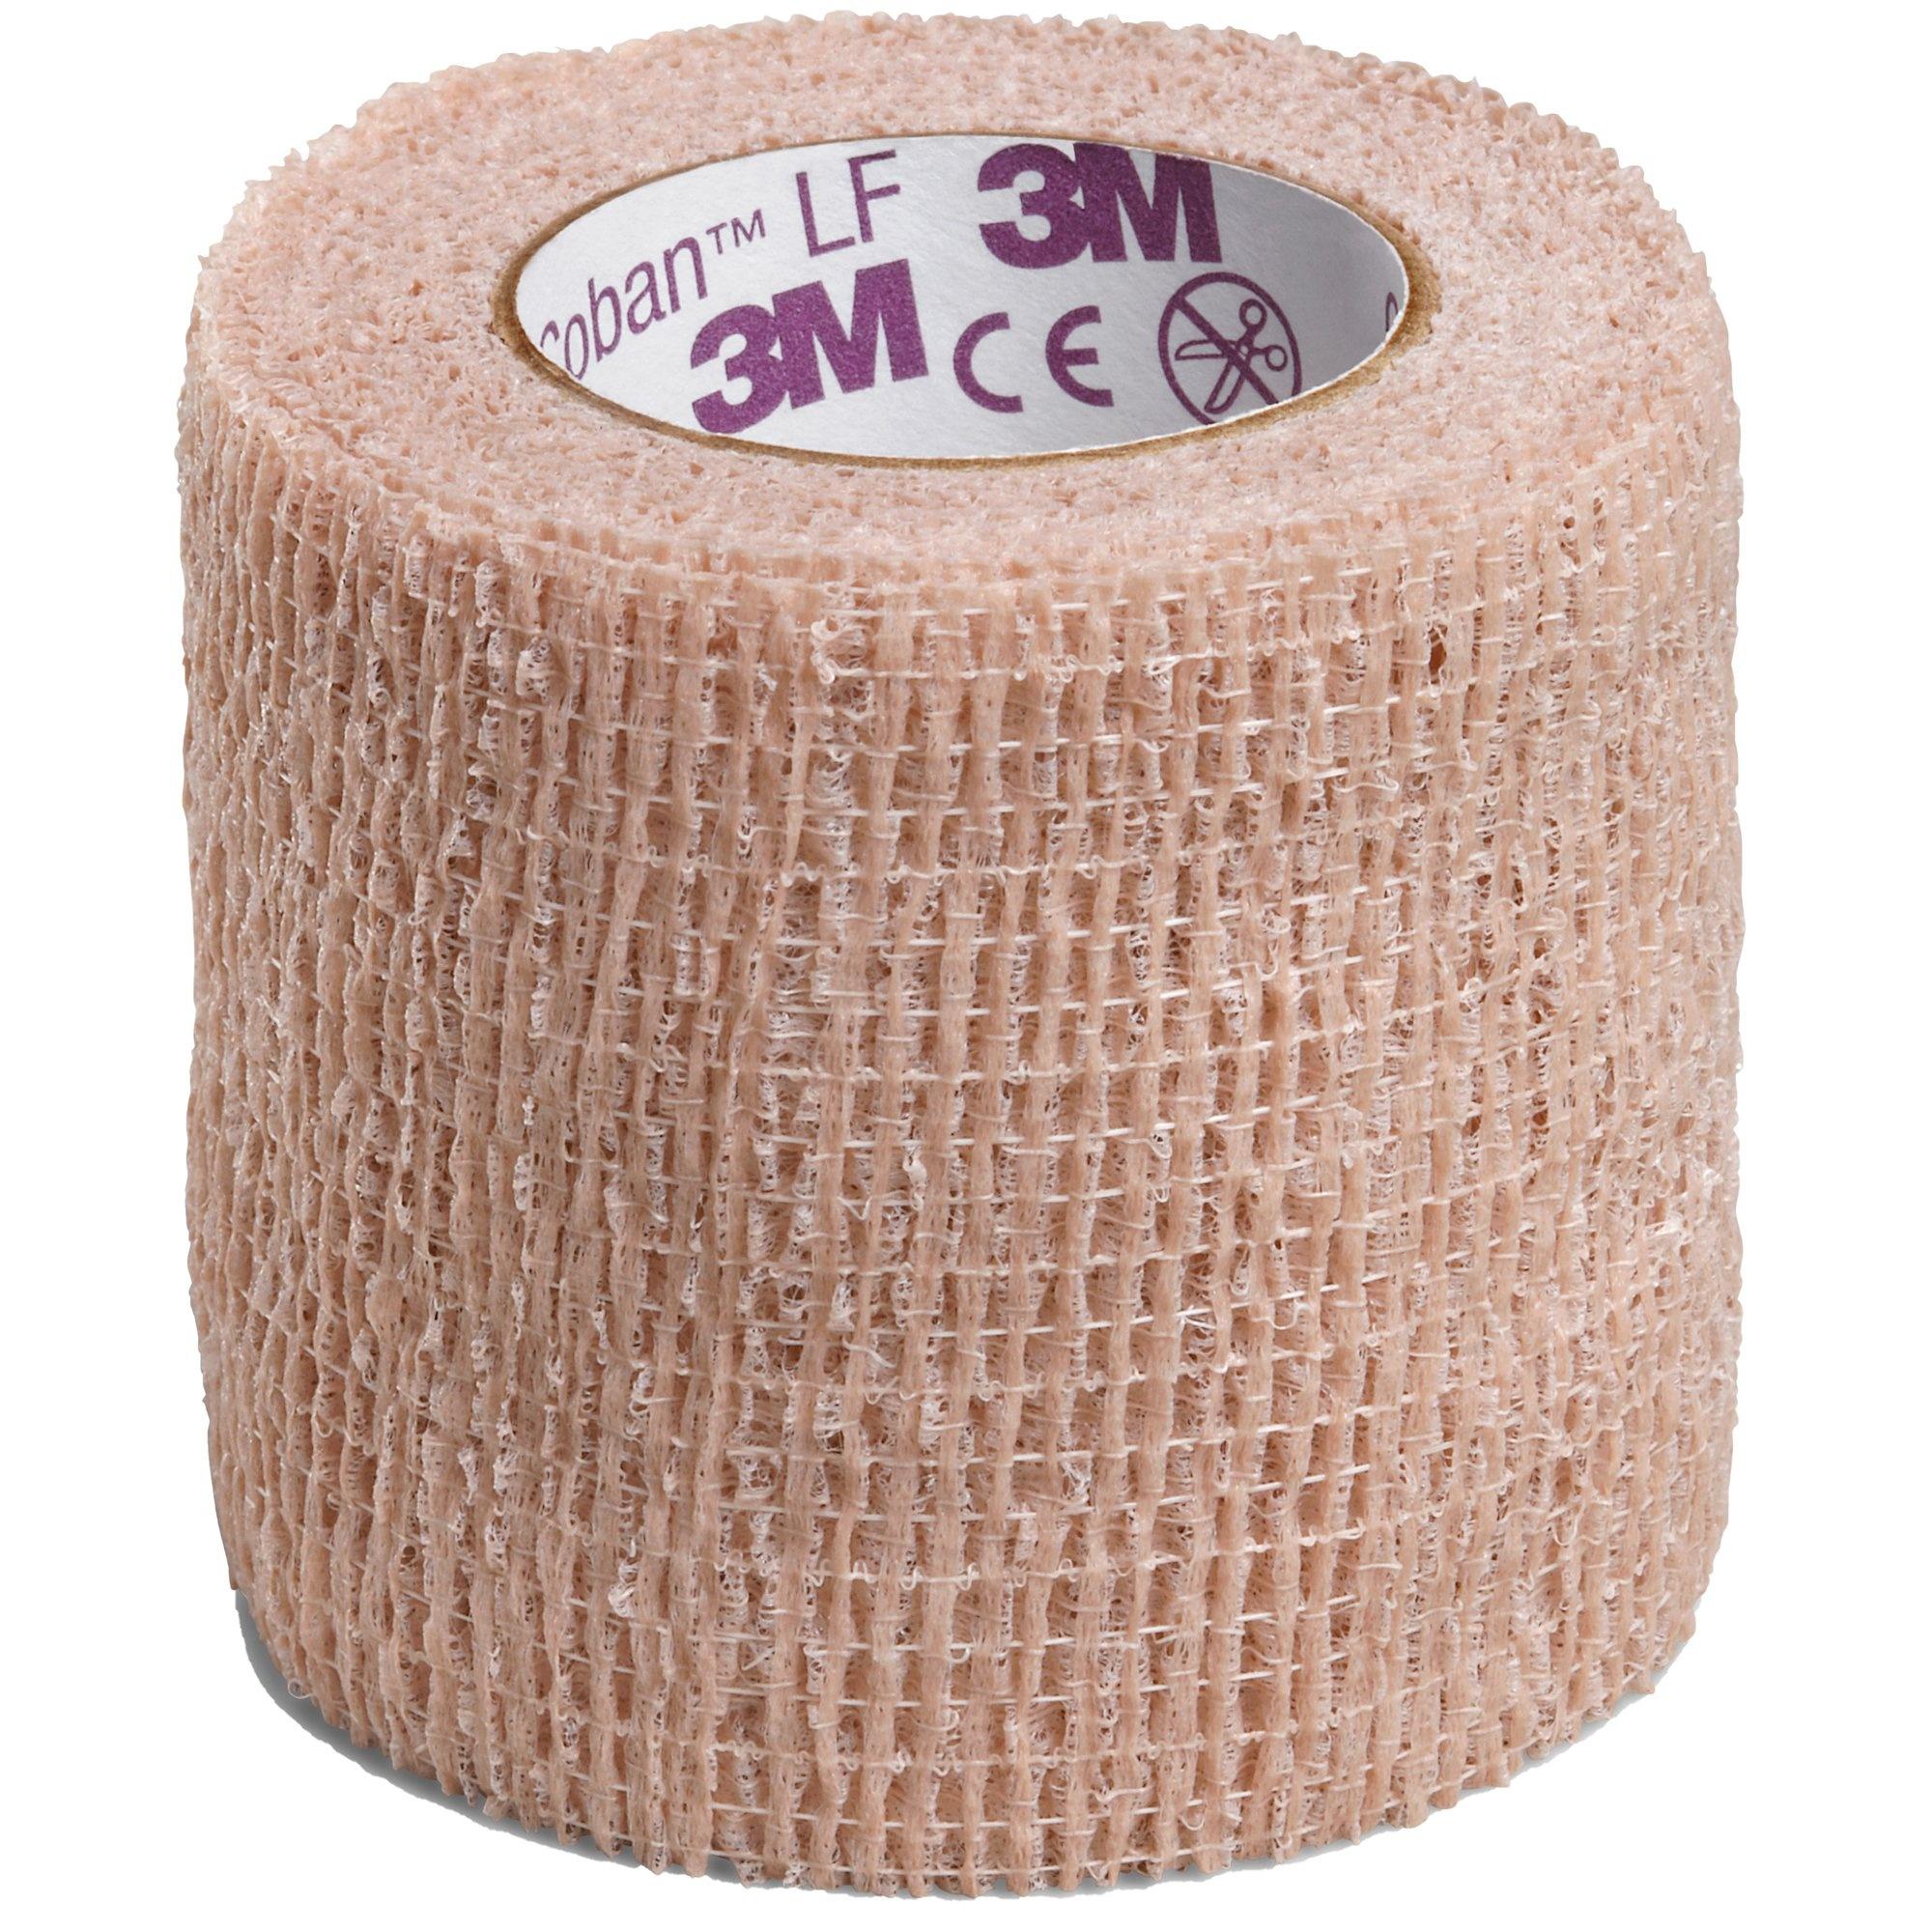 "3M Coban LF Cohesive Bandage, Standard Compression, Self-adherent Closure, 2"" X 5 yds, 2082, 1 Each"